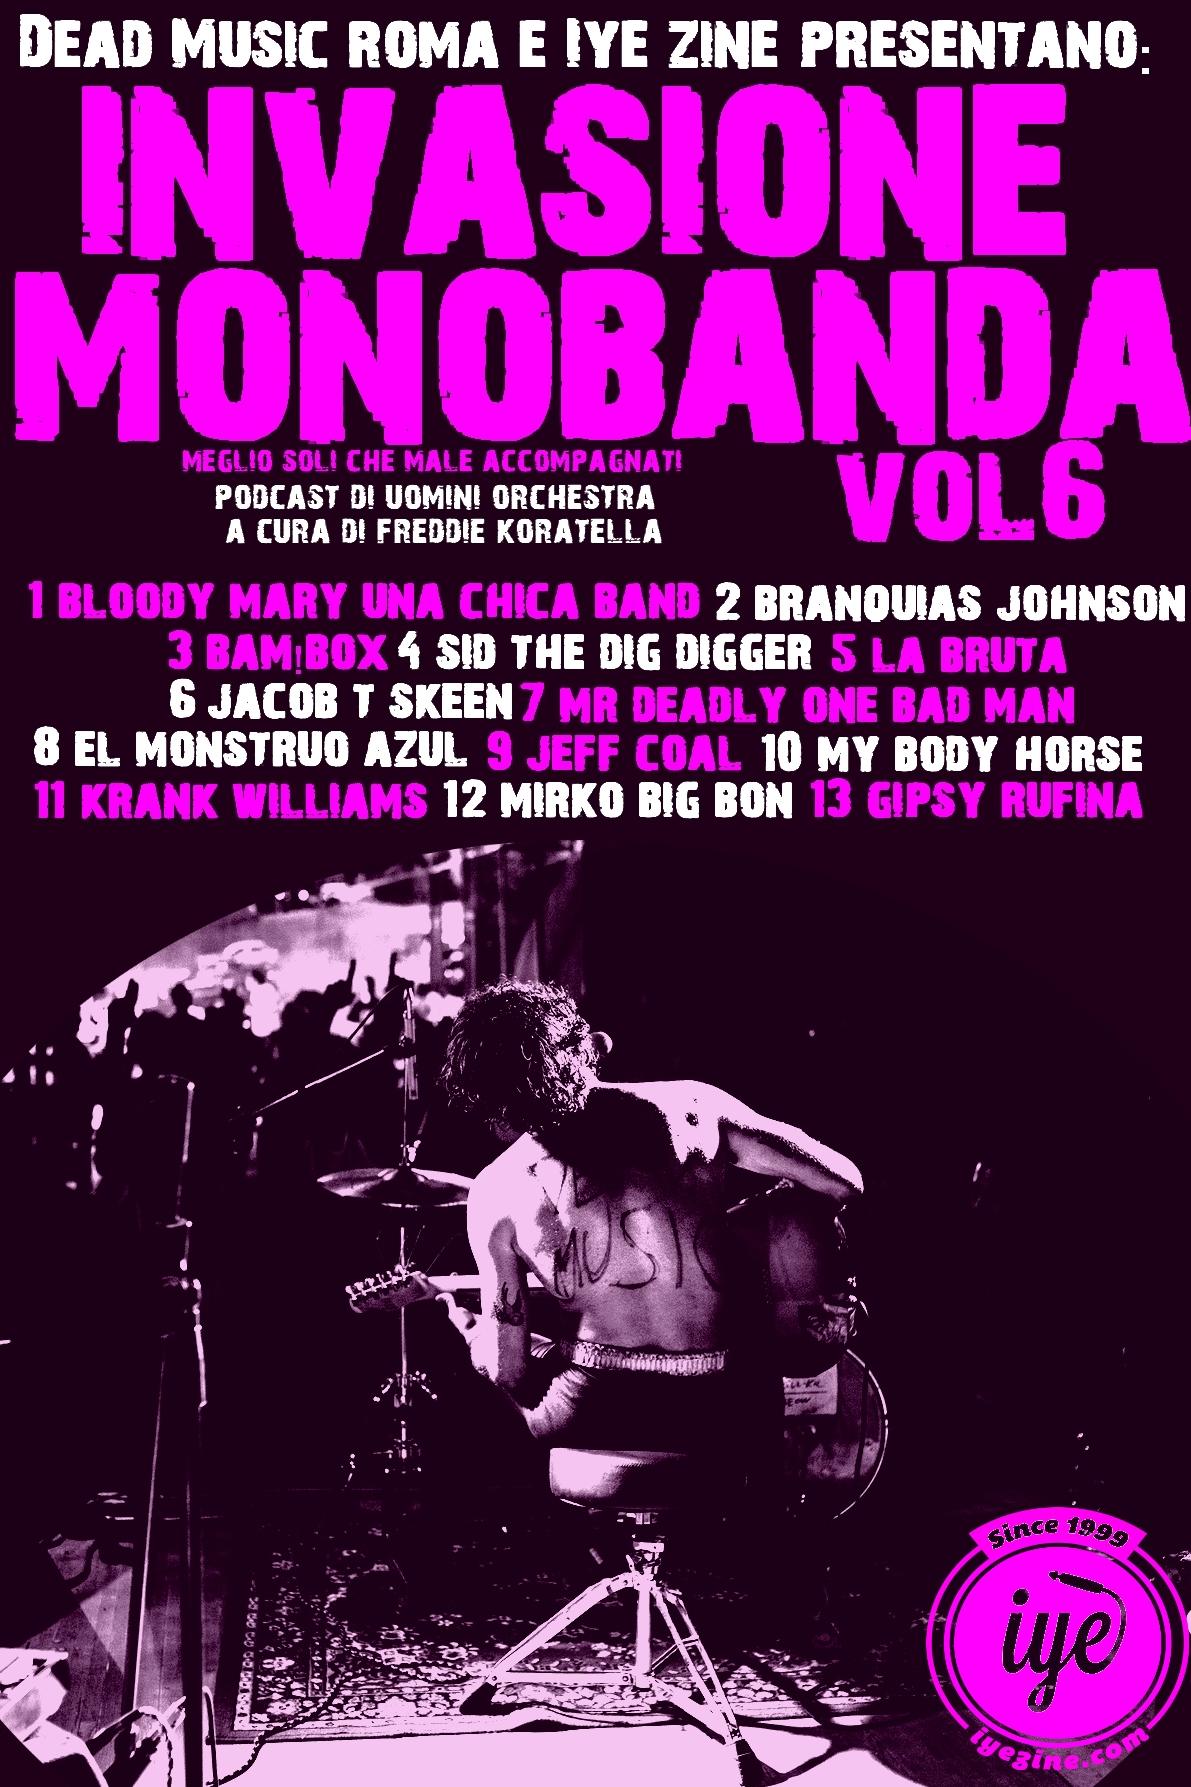 Invasione Monobanda vol. 6 1 - fanzine